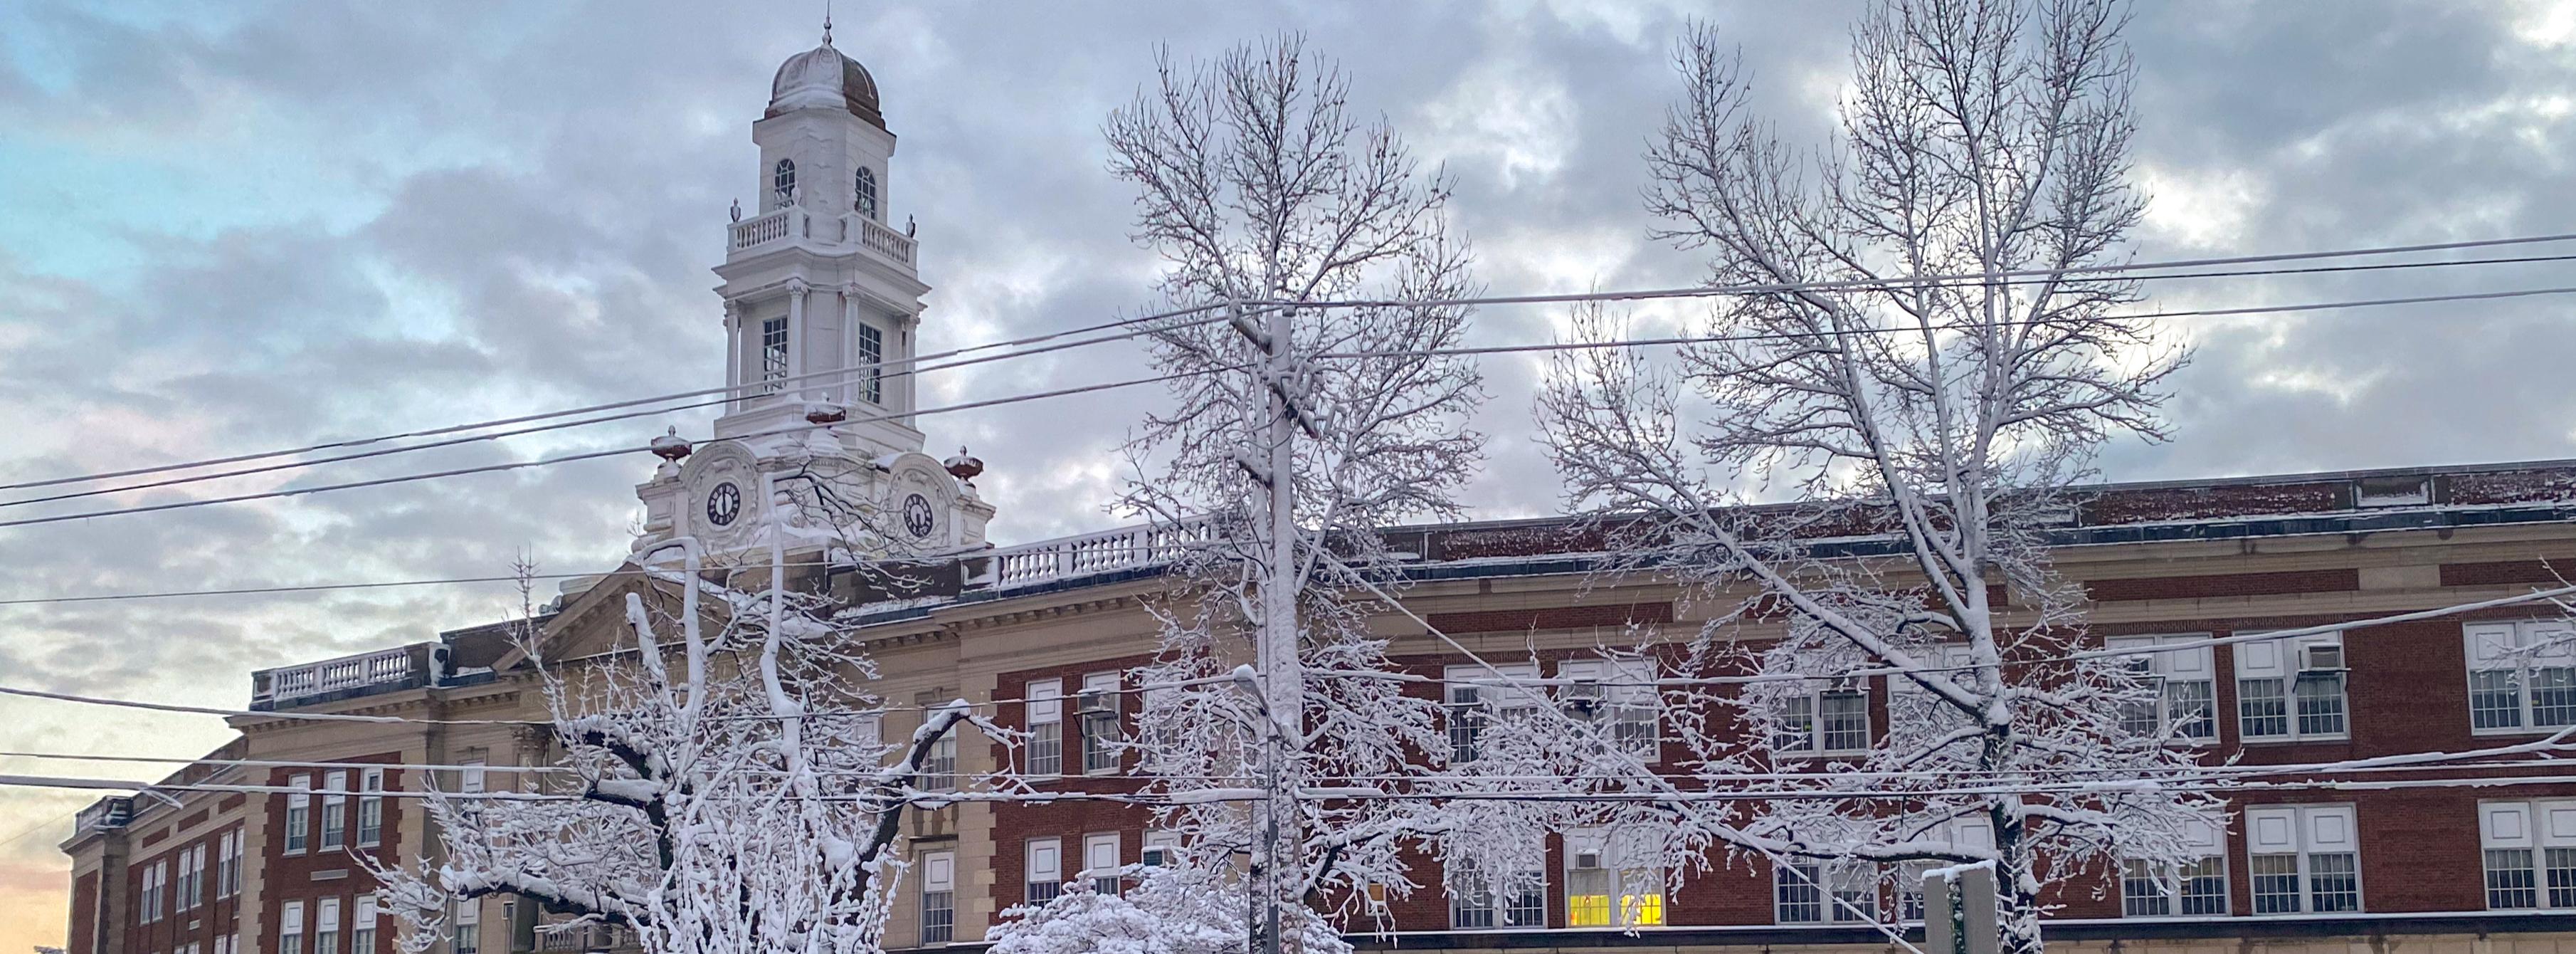 Sewanhaka High School in the Snow